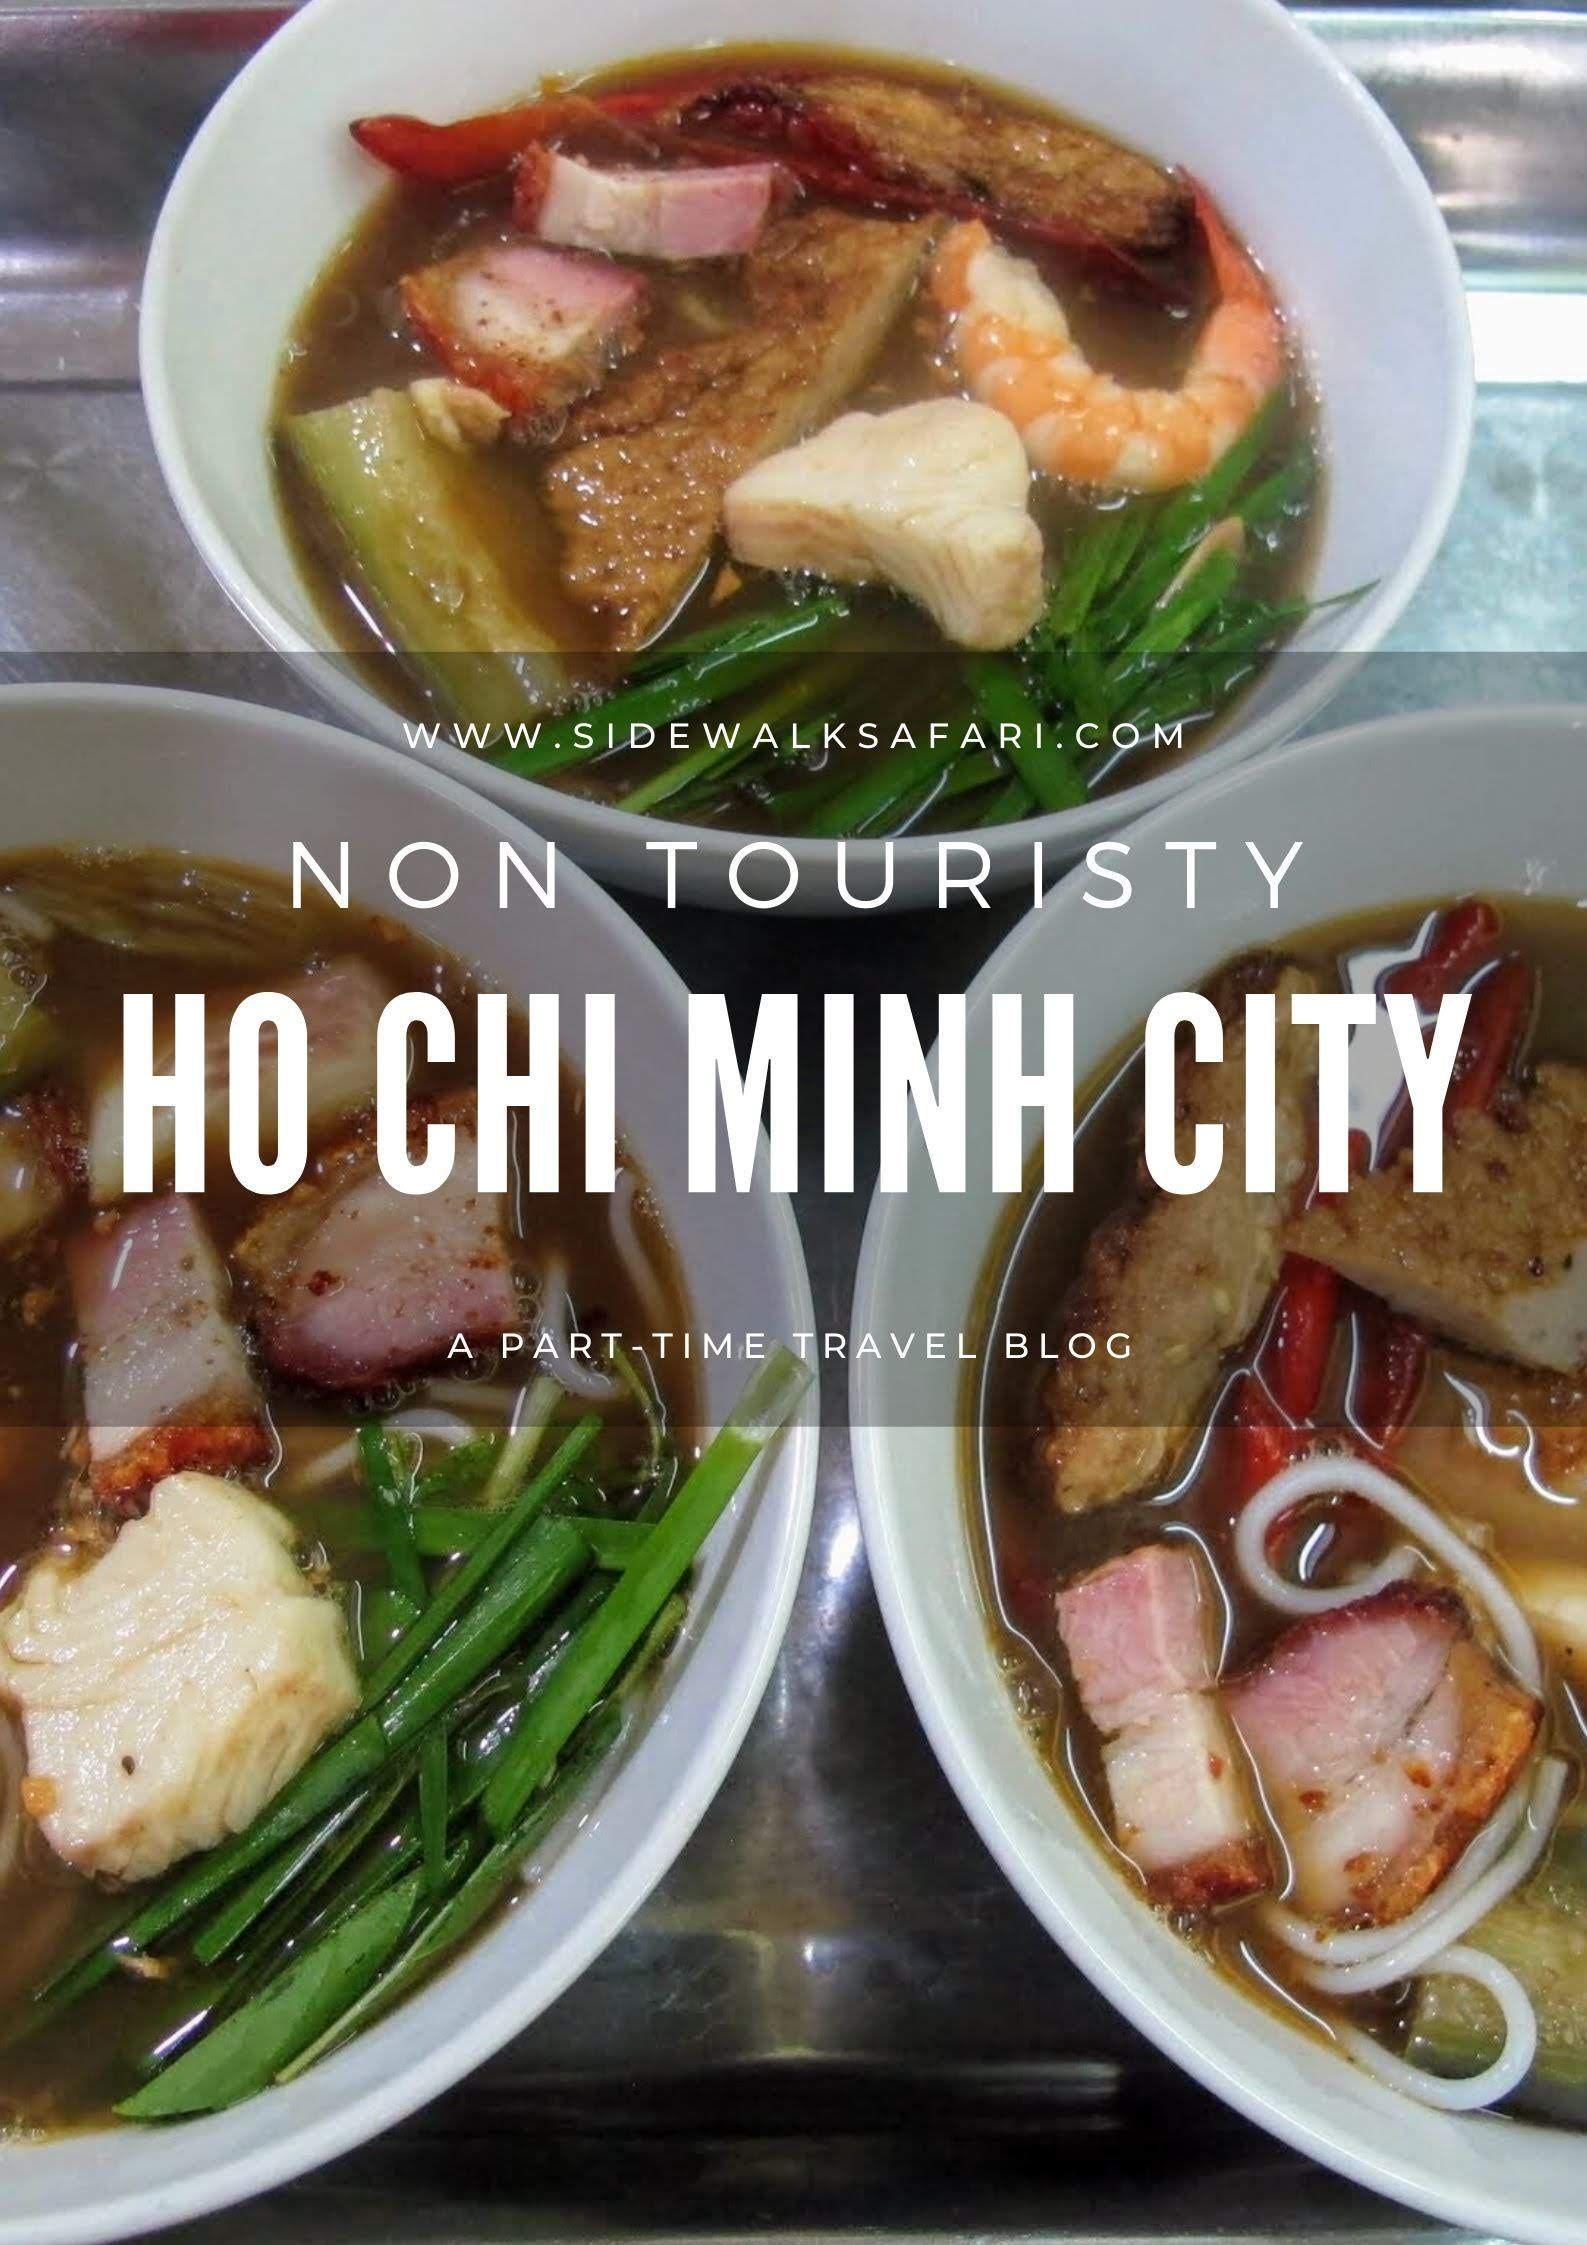 Non Touristy Things To Do Ho Chi Minh City Vietnam In 2020 Ho Chi Minh City Ho Chi Minh Vietnam Travel